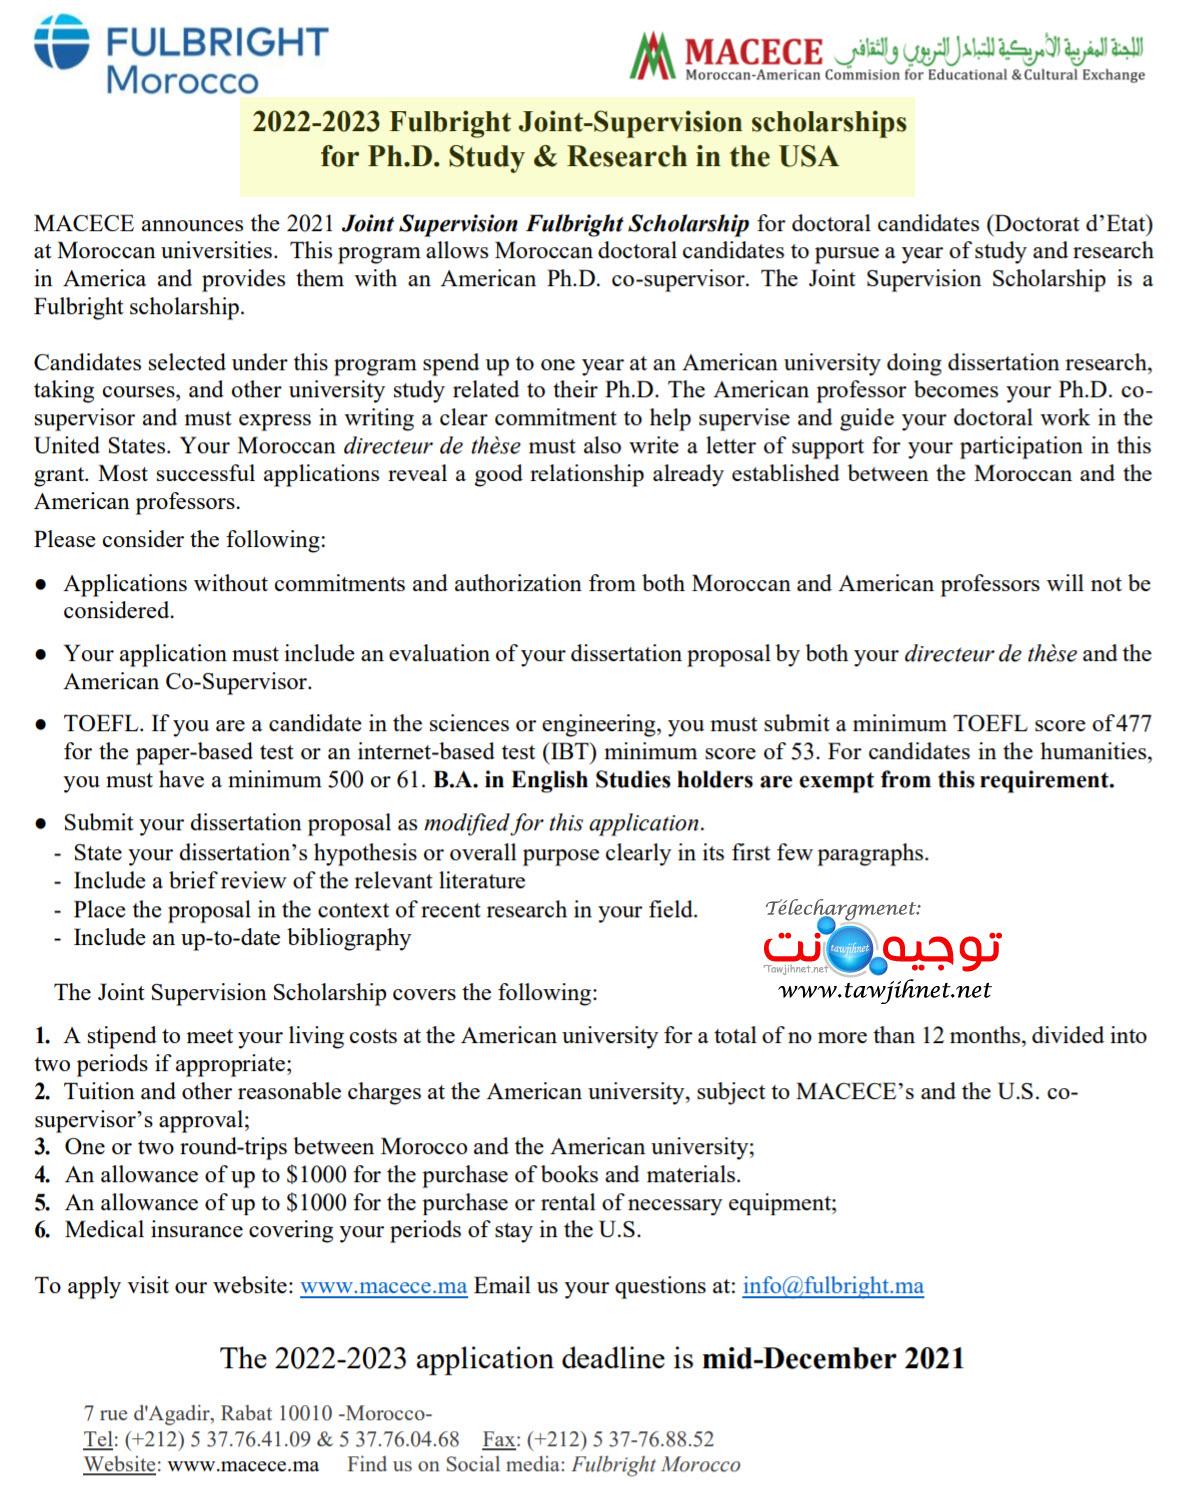 Fulbright Joint-Supervision scholarships 2022 2023.jpg